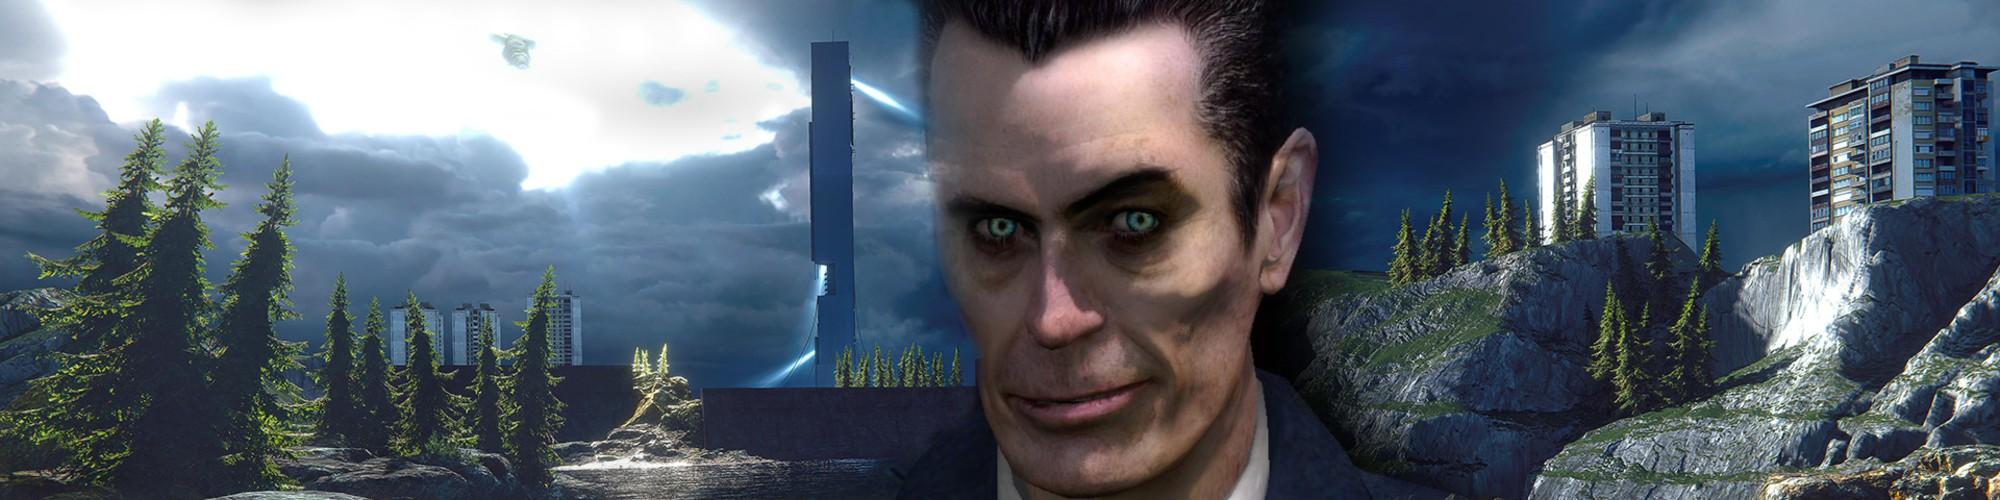 Half-Life G-Man